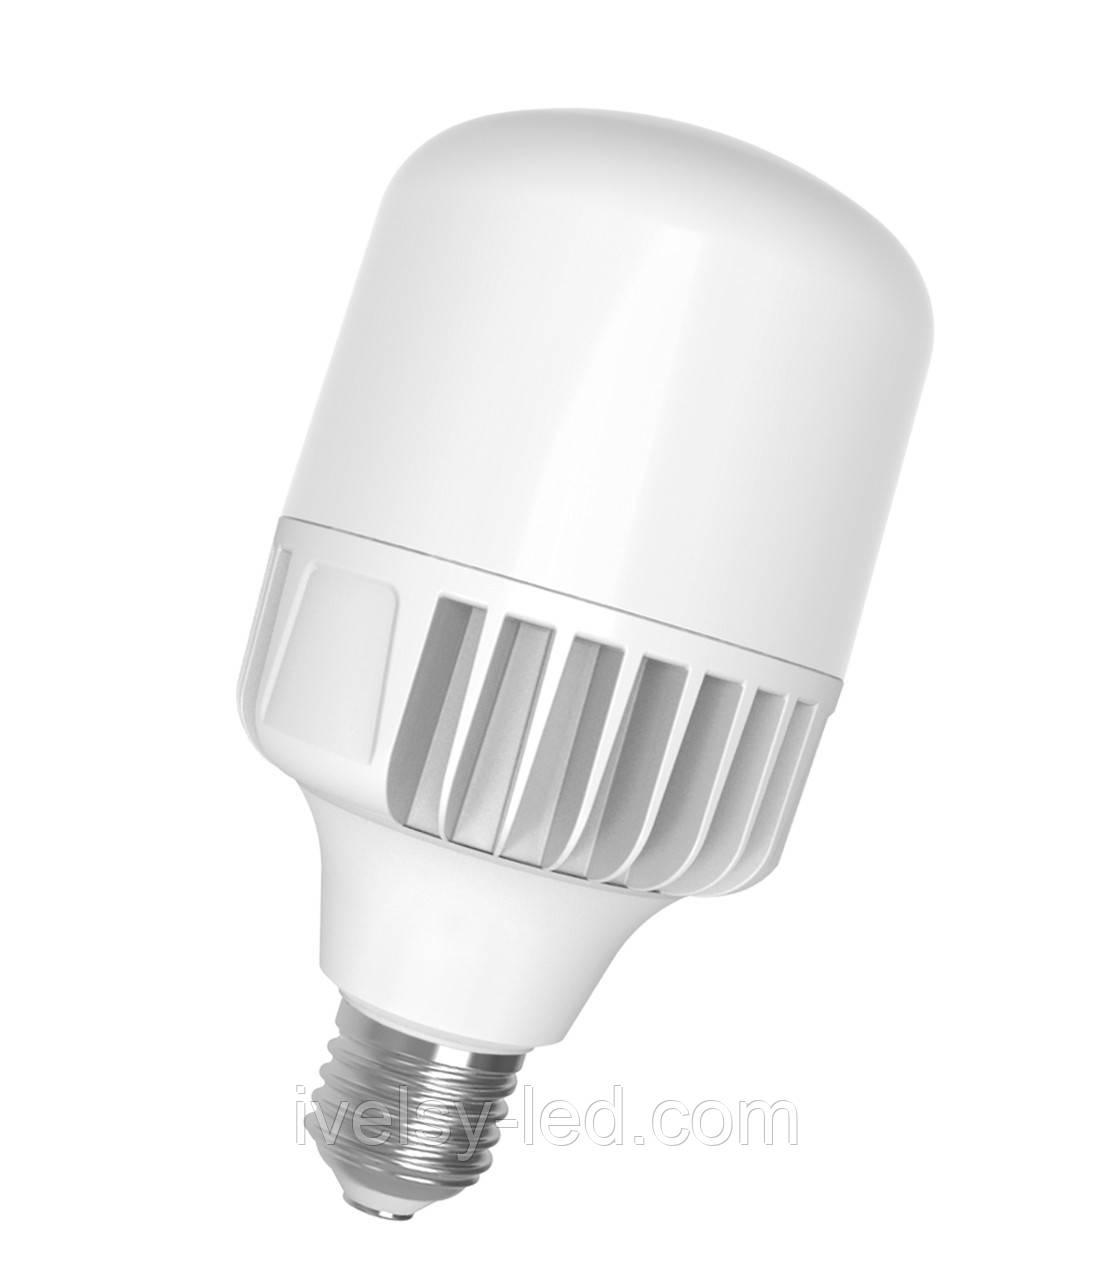 LED Лампа EUROLAMP высокомощная 50W E40 6500K